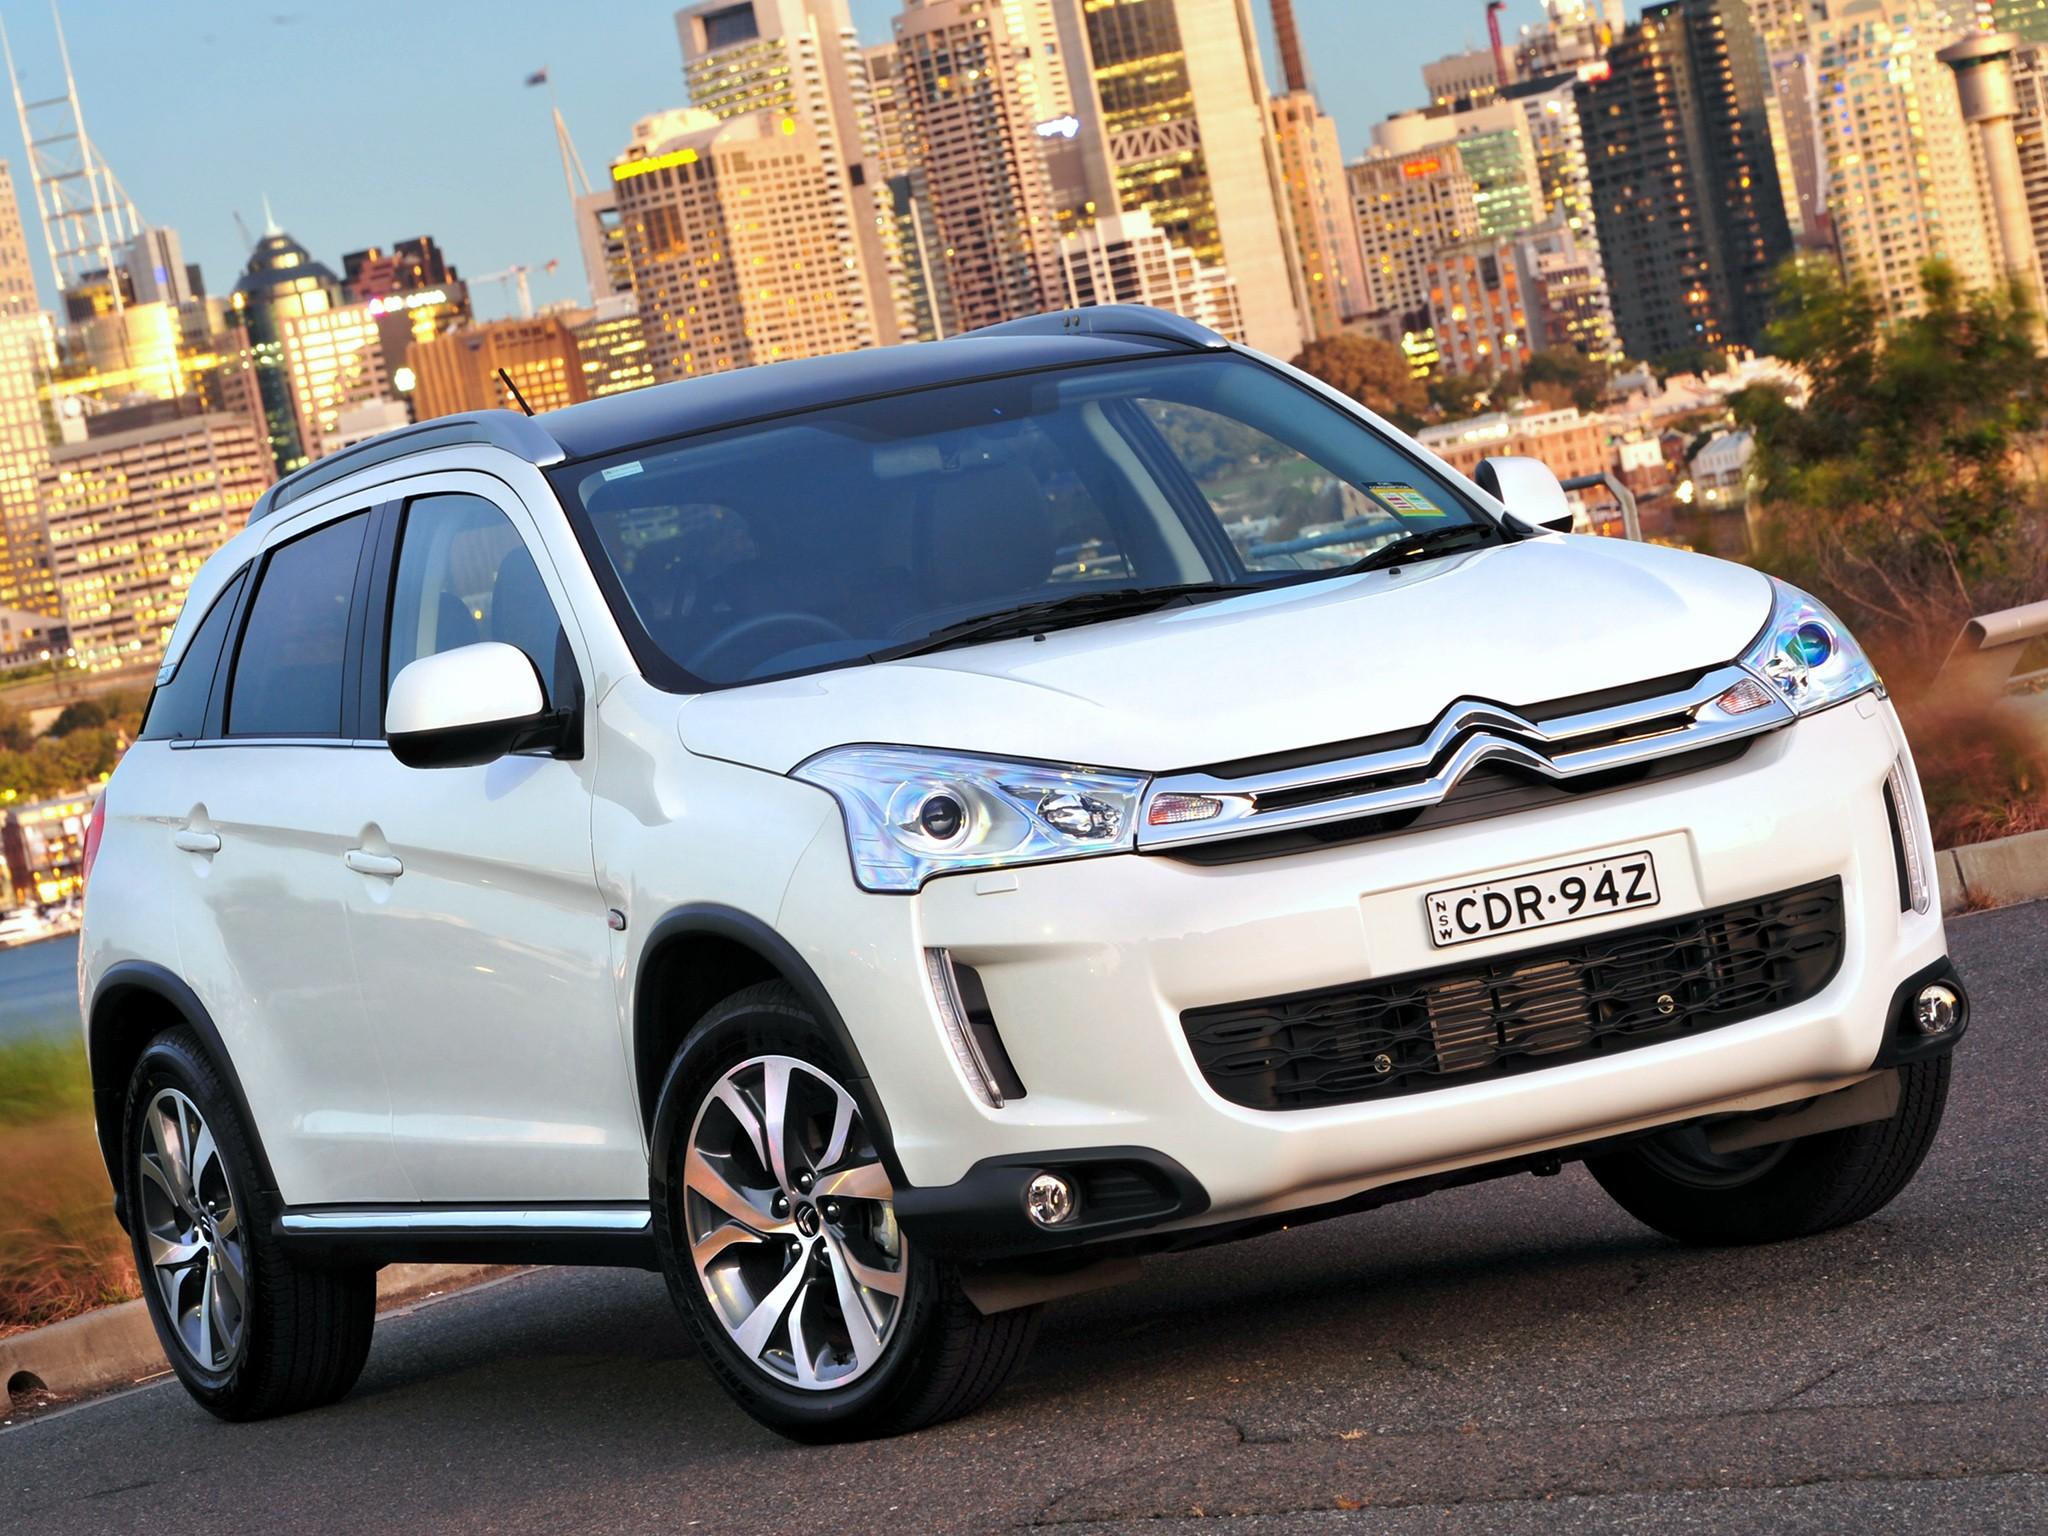 First Choice Auto Sales >> CITROEN C4 Aircross specs & photos - 2012, 2013, 2014 ...